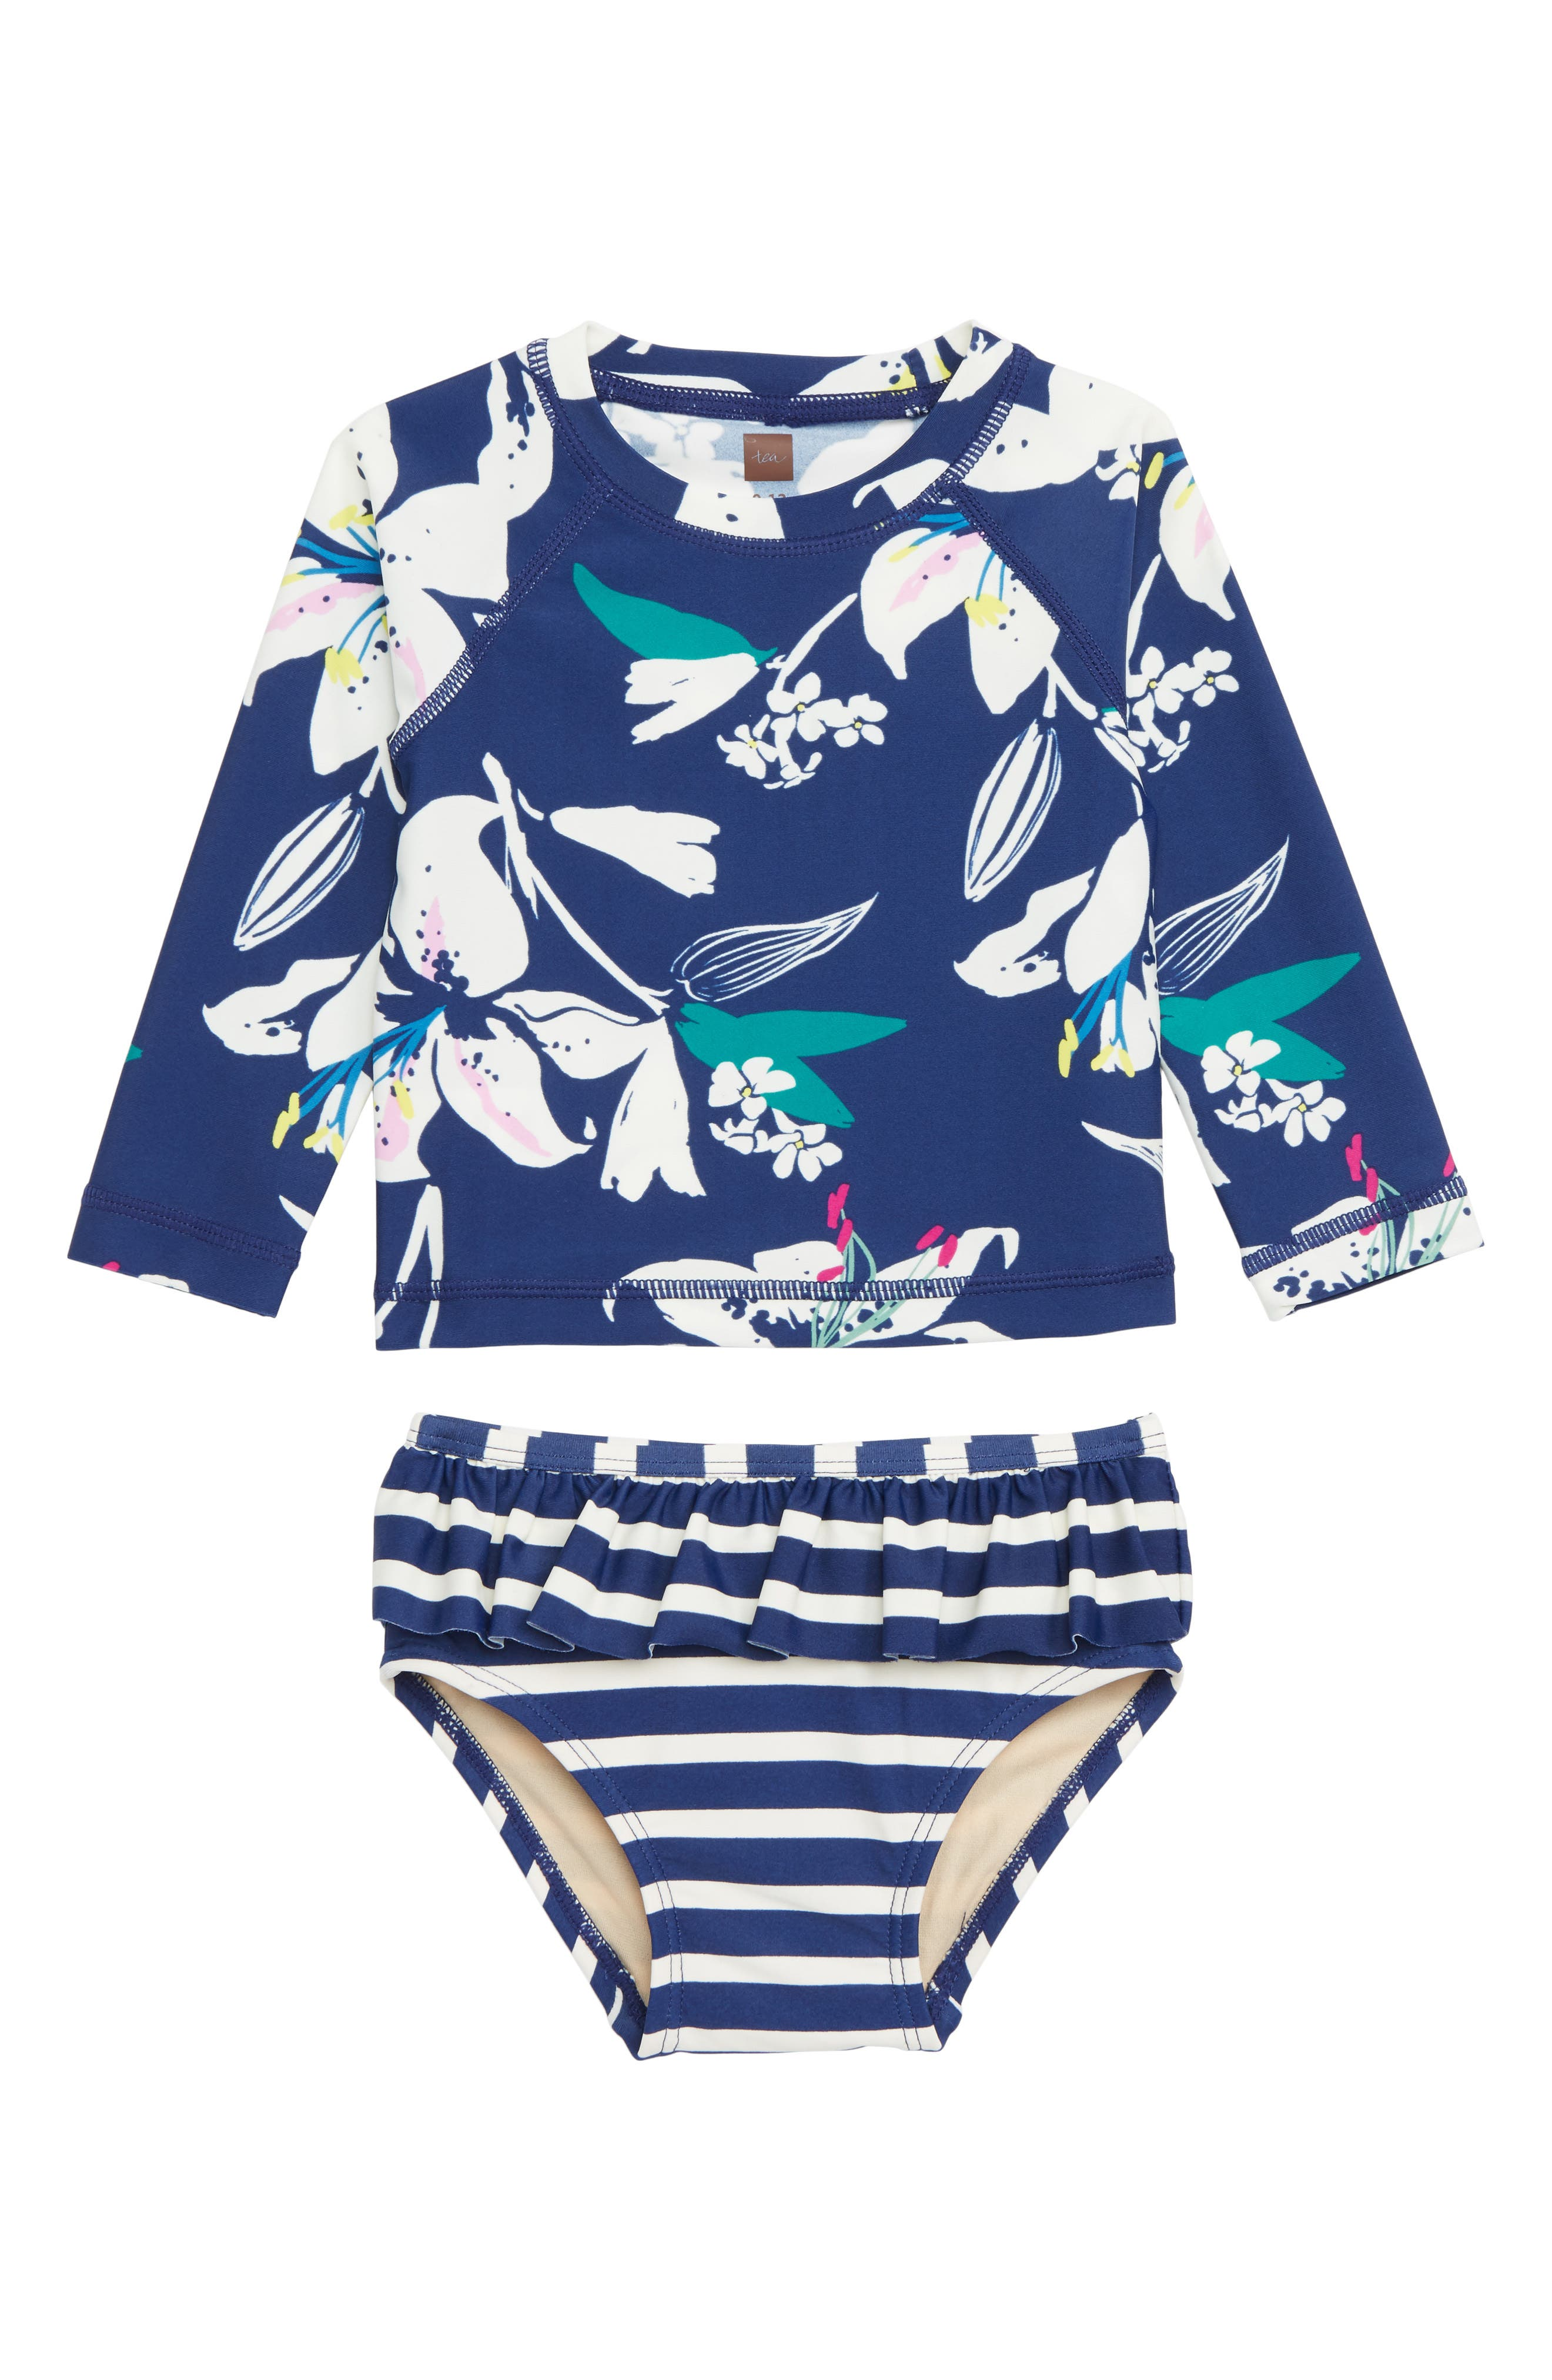 0960f1e7f5 Infant Girl's Tea Collection Mixed Print Two-Piece Rashguard Swimsuit, Blue